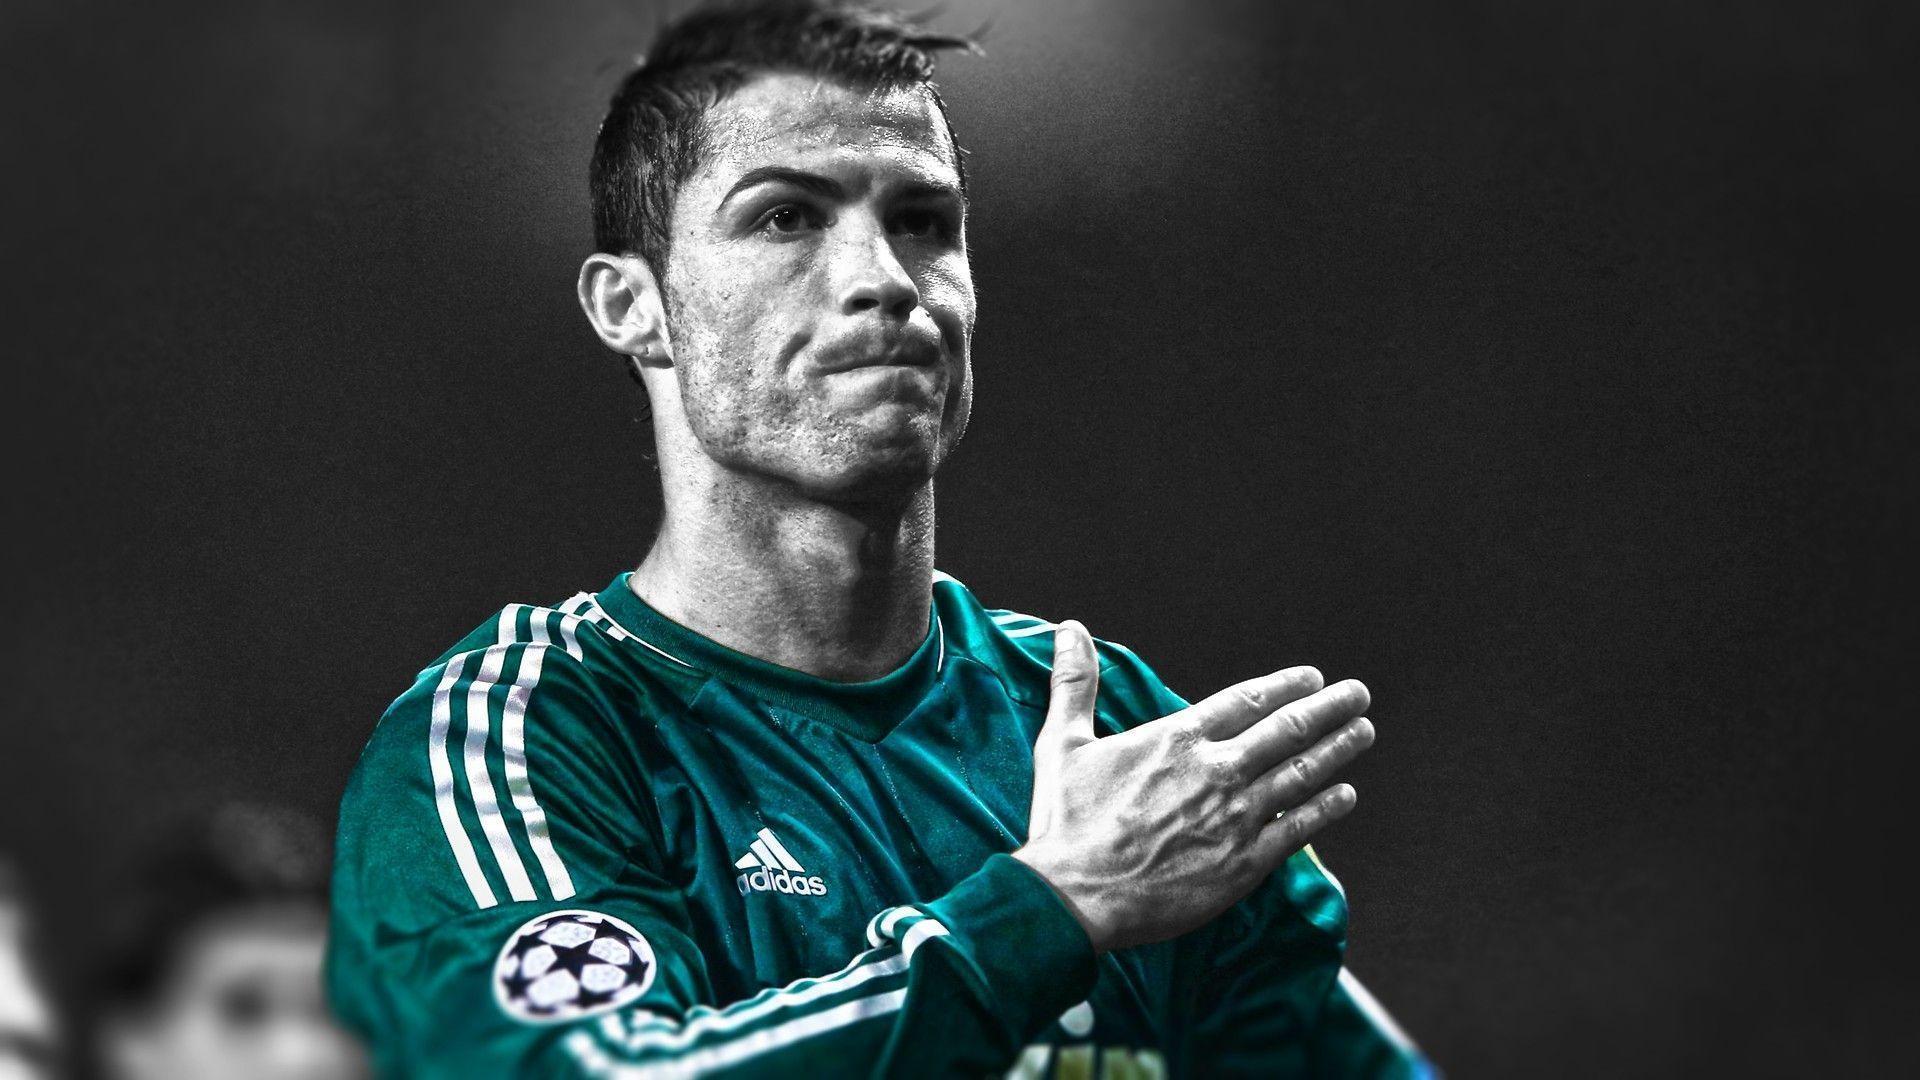 Cristiano Ronaldo Wallpapers | Wallpapers Top 10